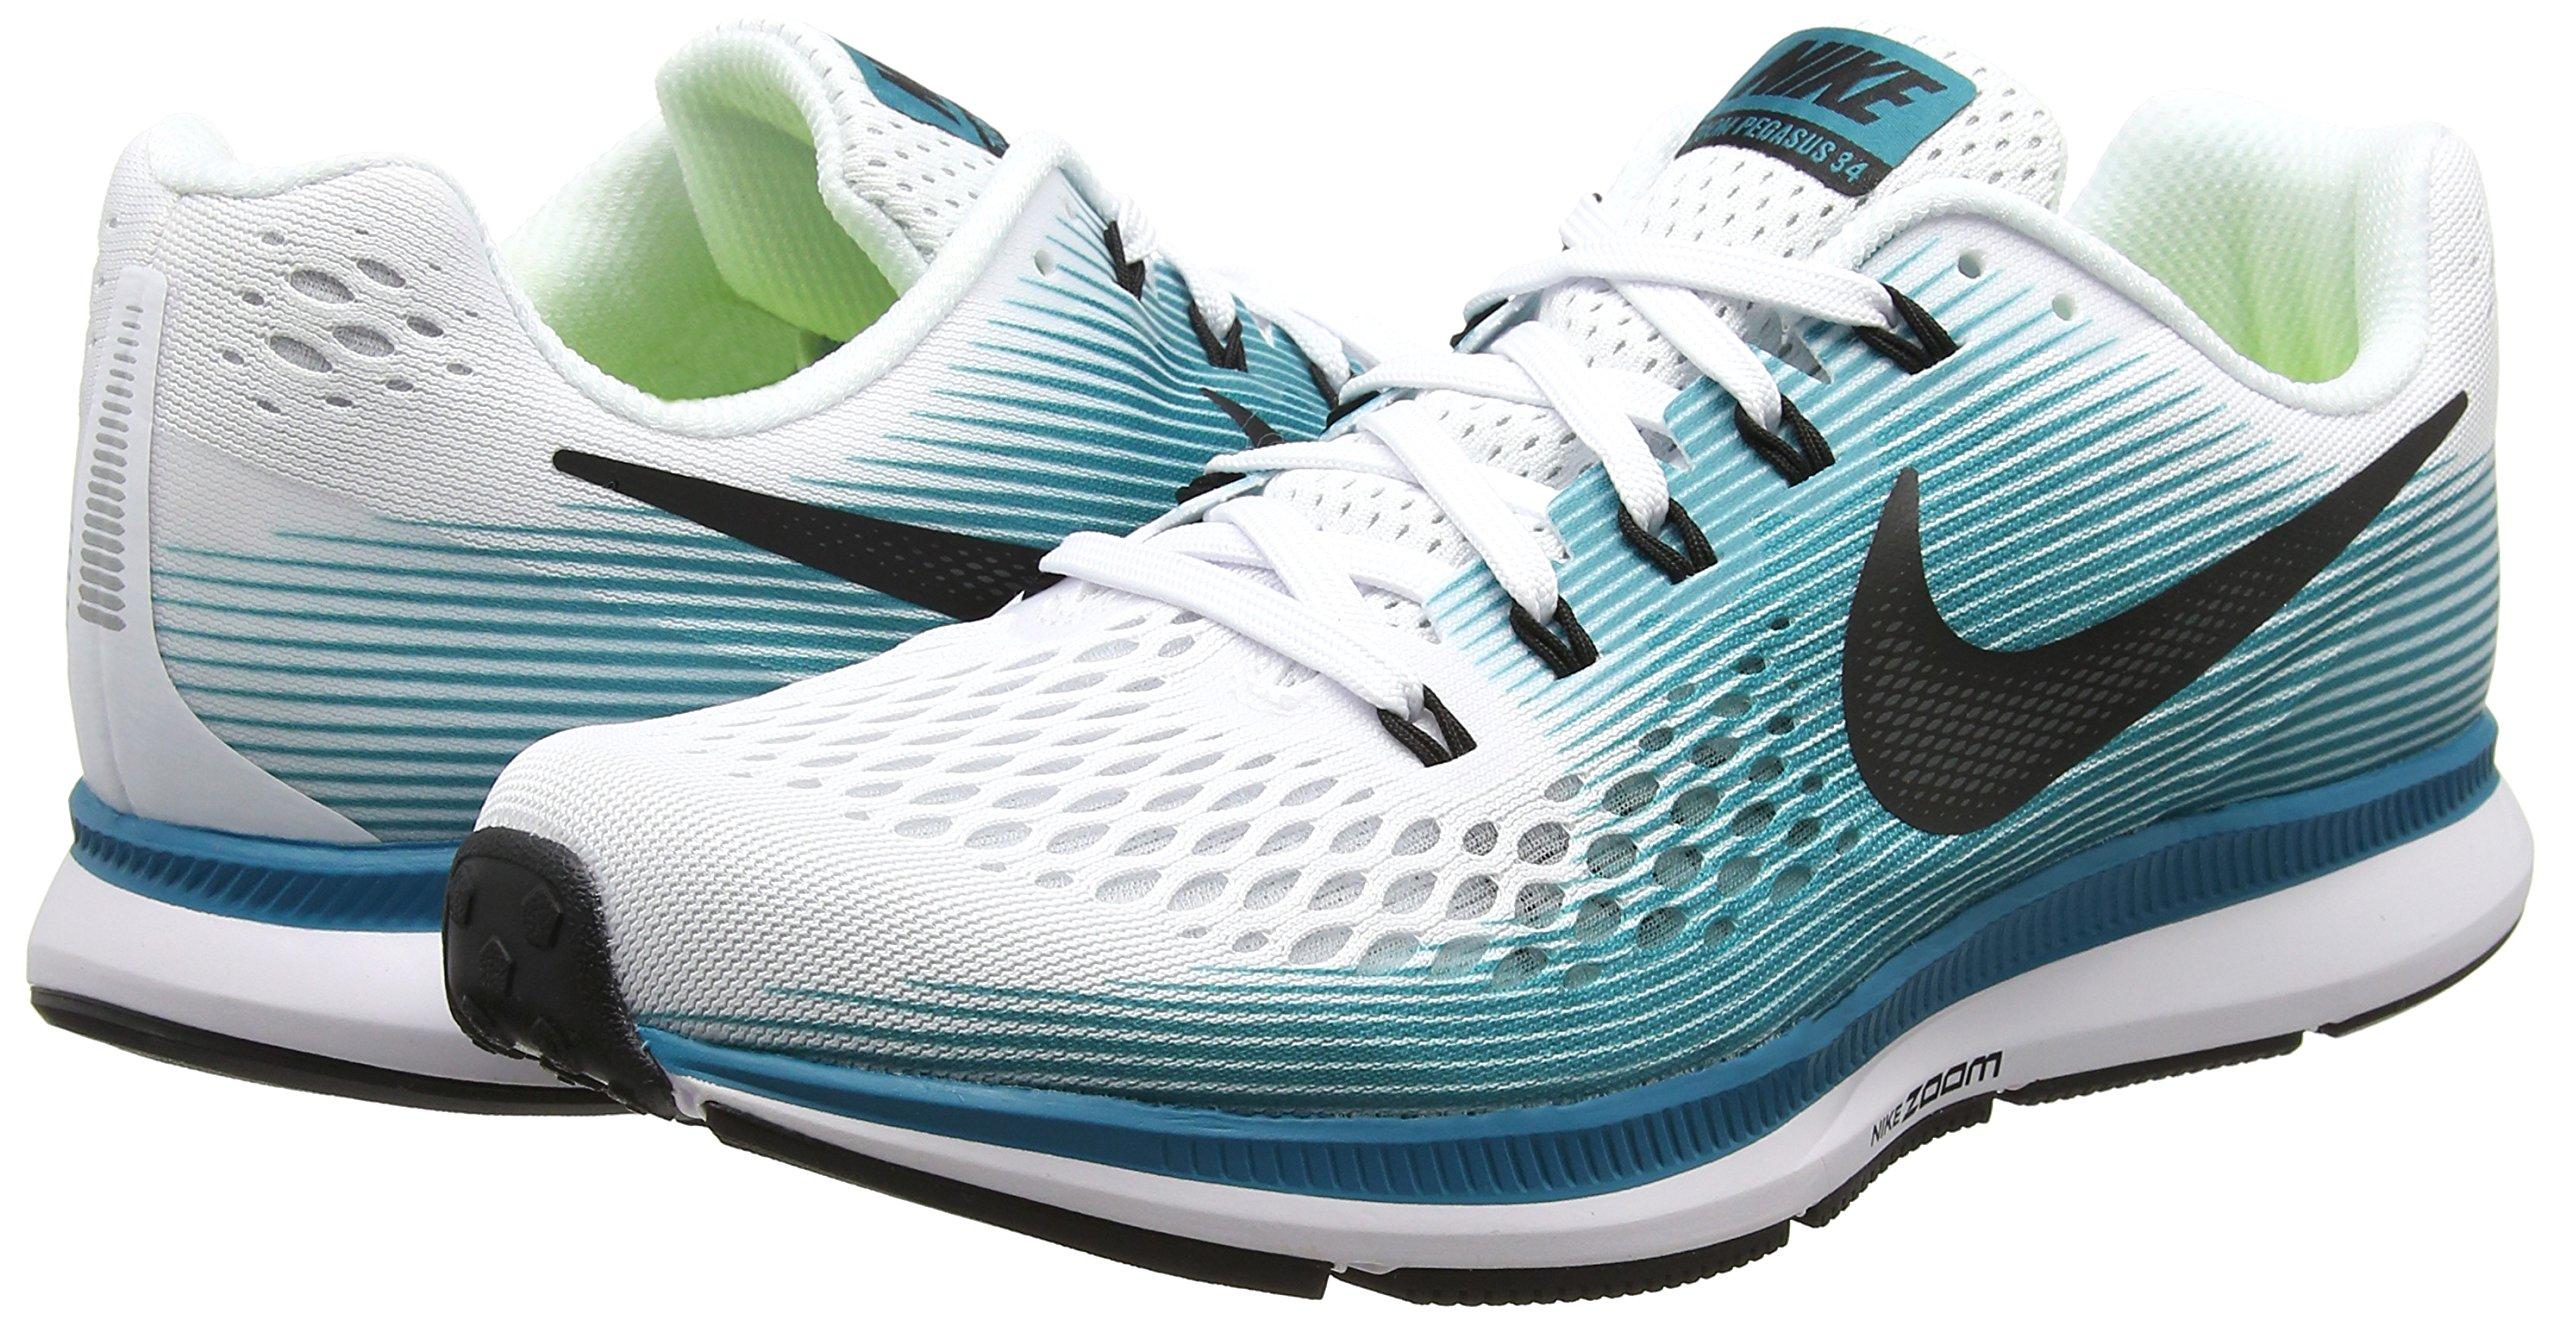 Nike Men's Air Zoom Pegasus 34 White / Black - Blustery 880555-101 (11.5) by NIKE (Image #5)